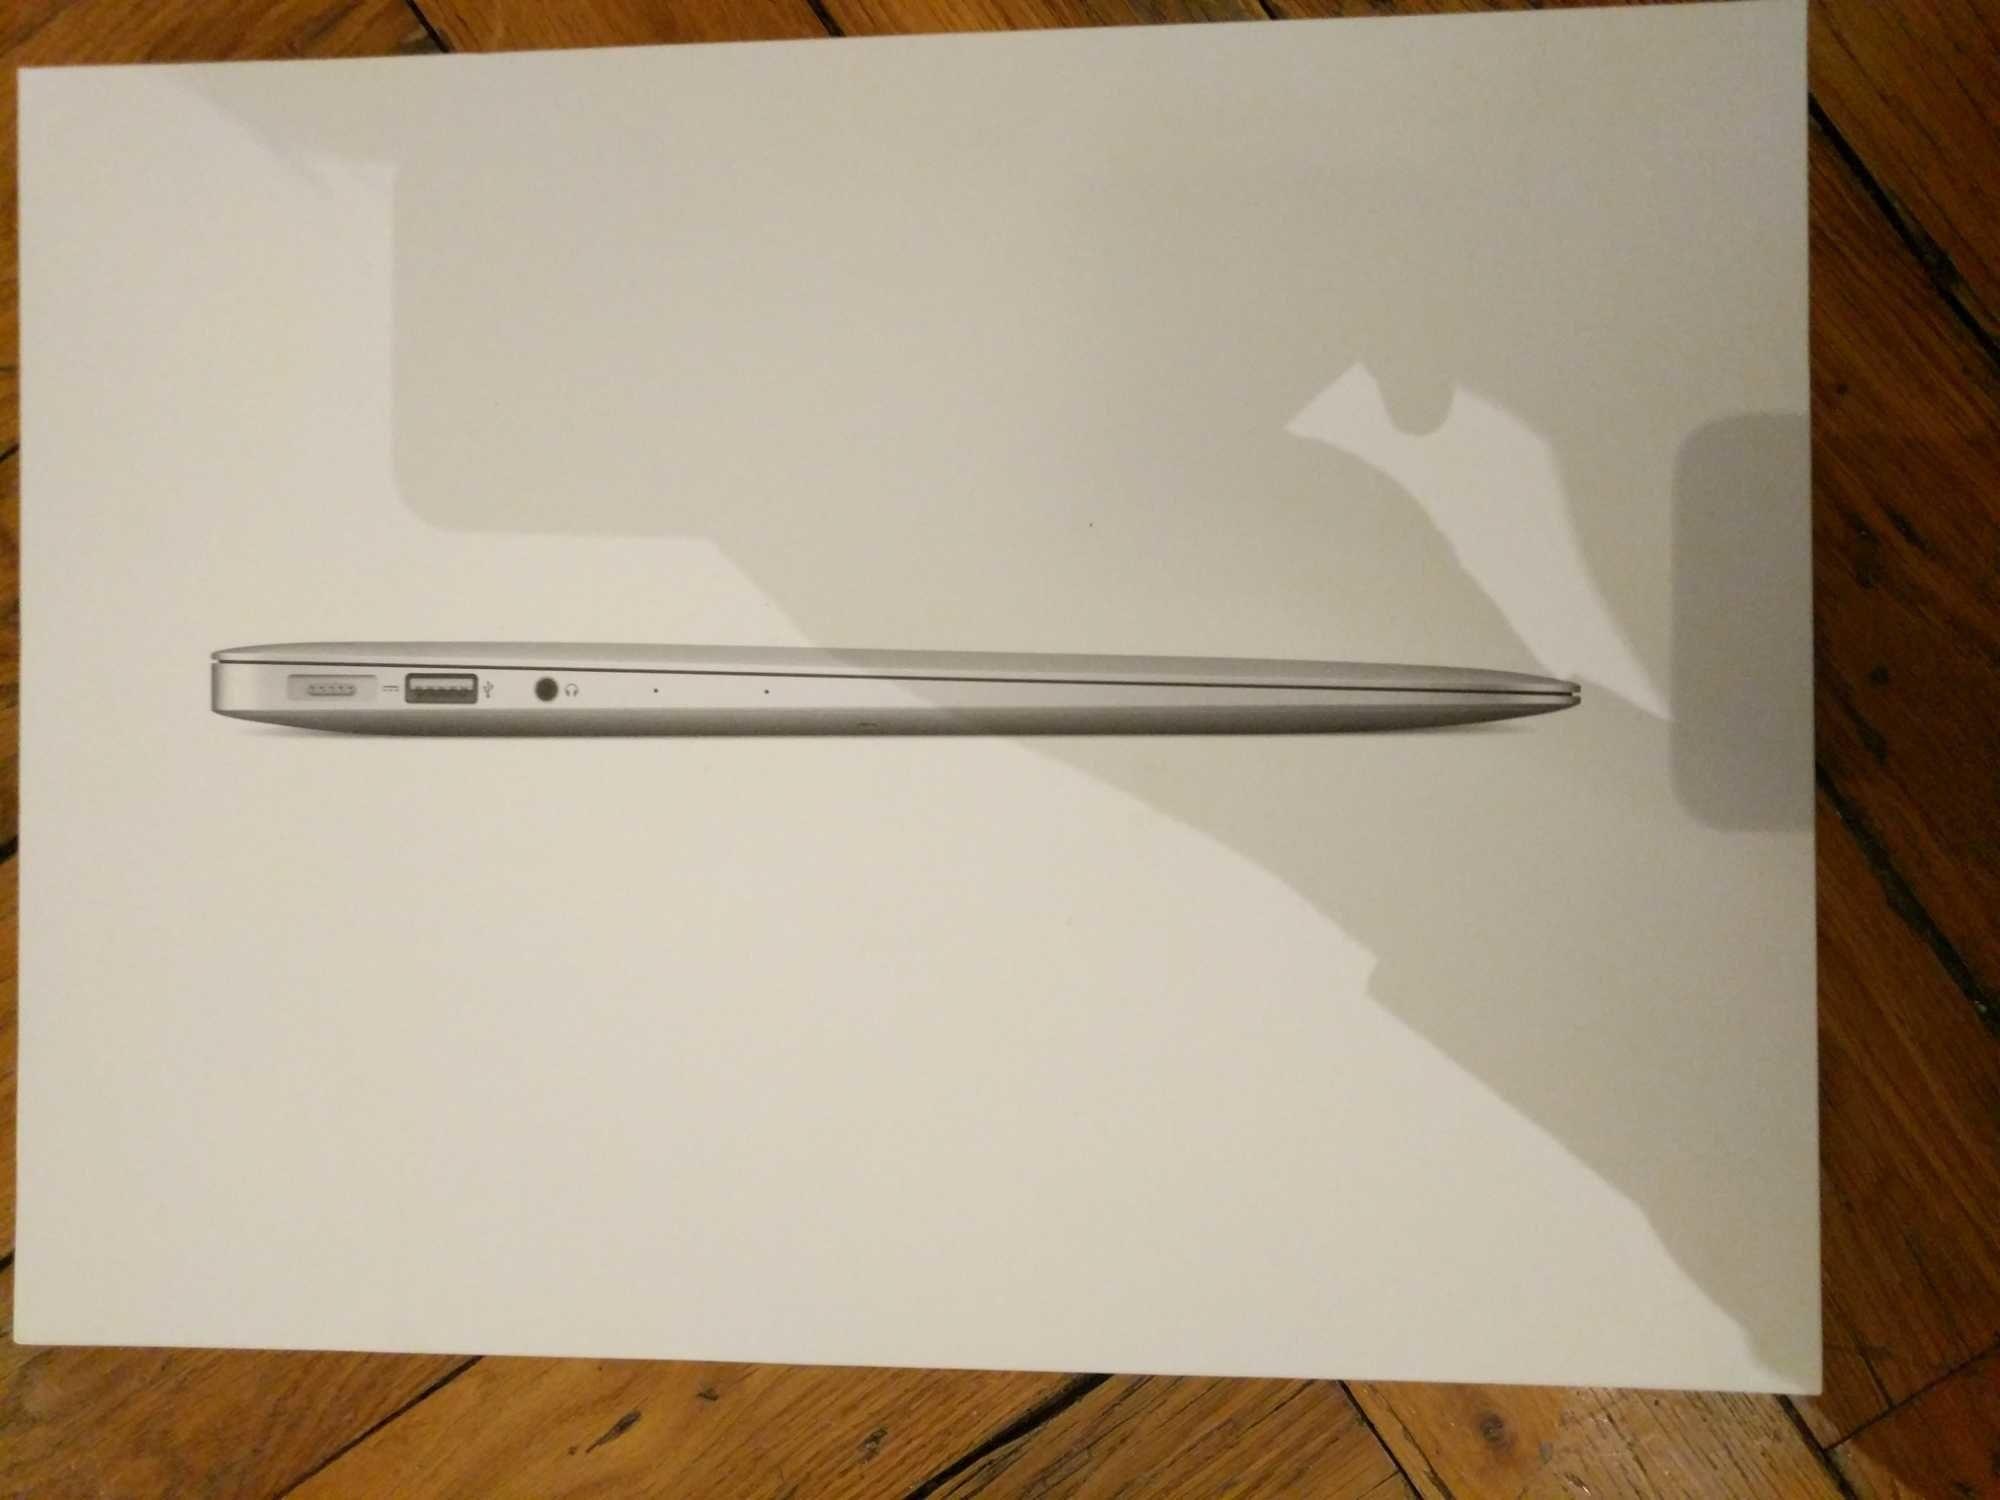 Macbook AIR 13'' i5 1.8Ghz 128Go 2017 - Produit - fr